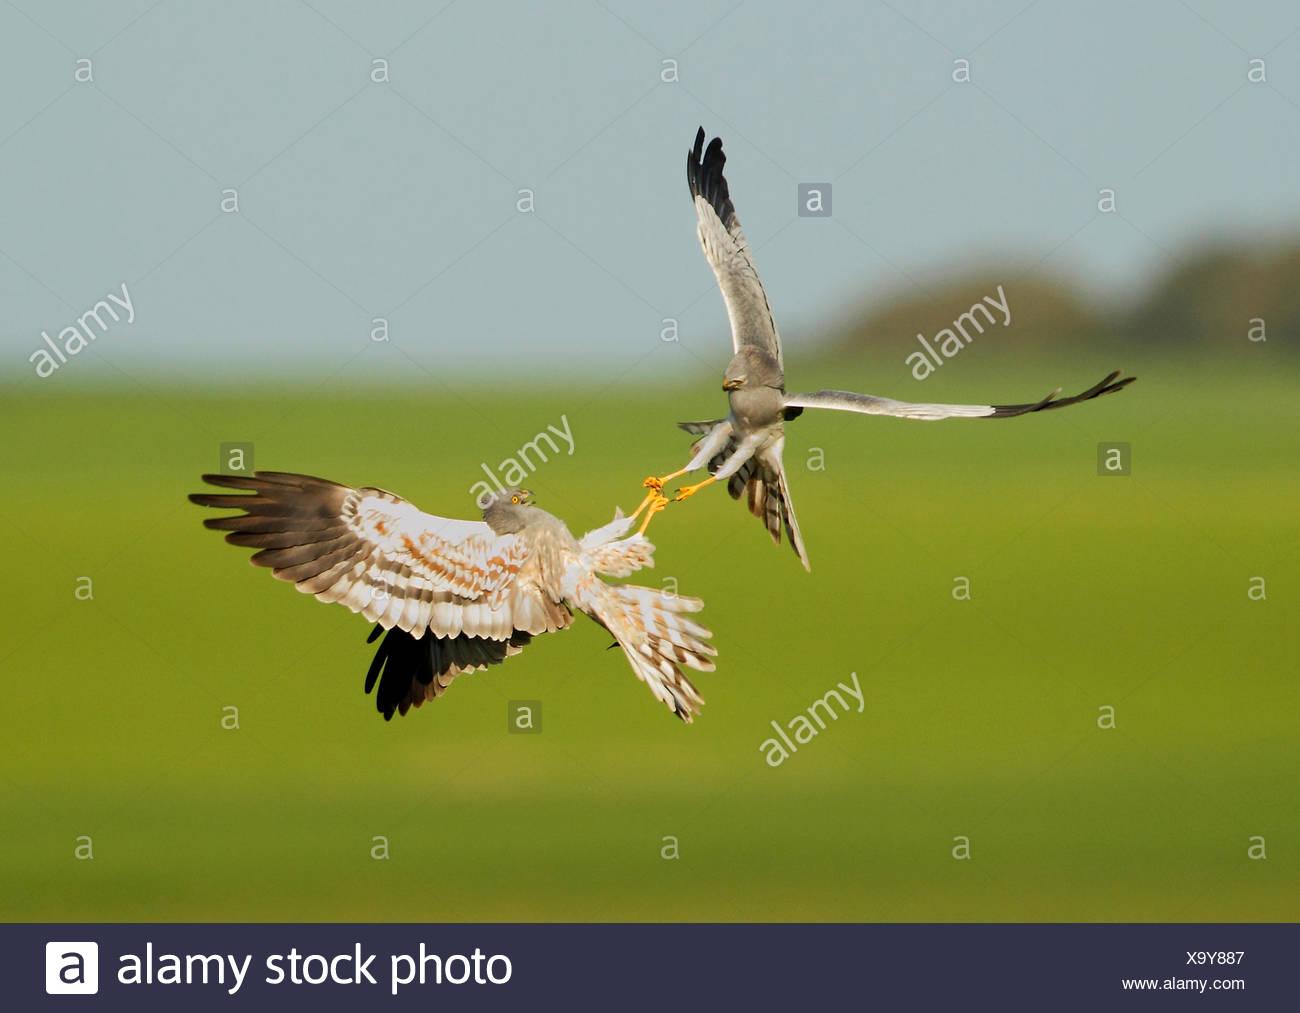 Montagu's Harriers fighting in flight - Spain Stock Photo